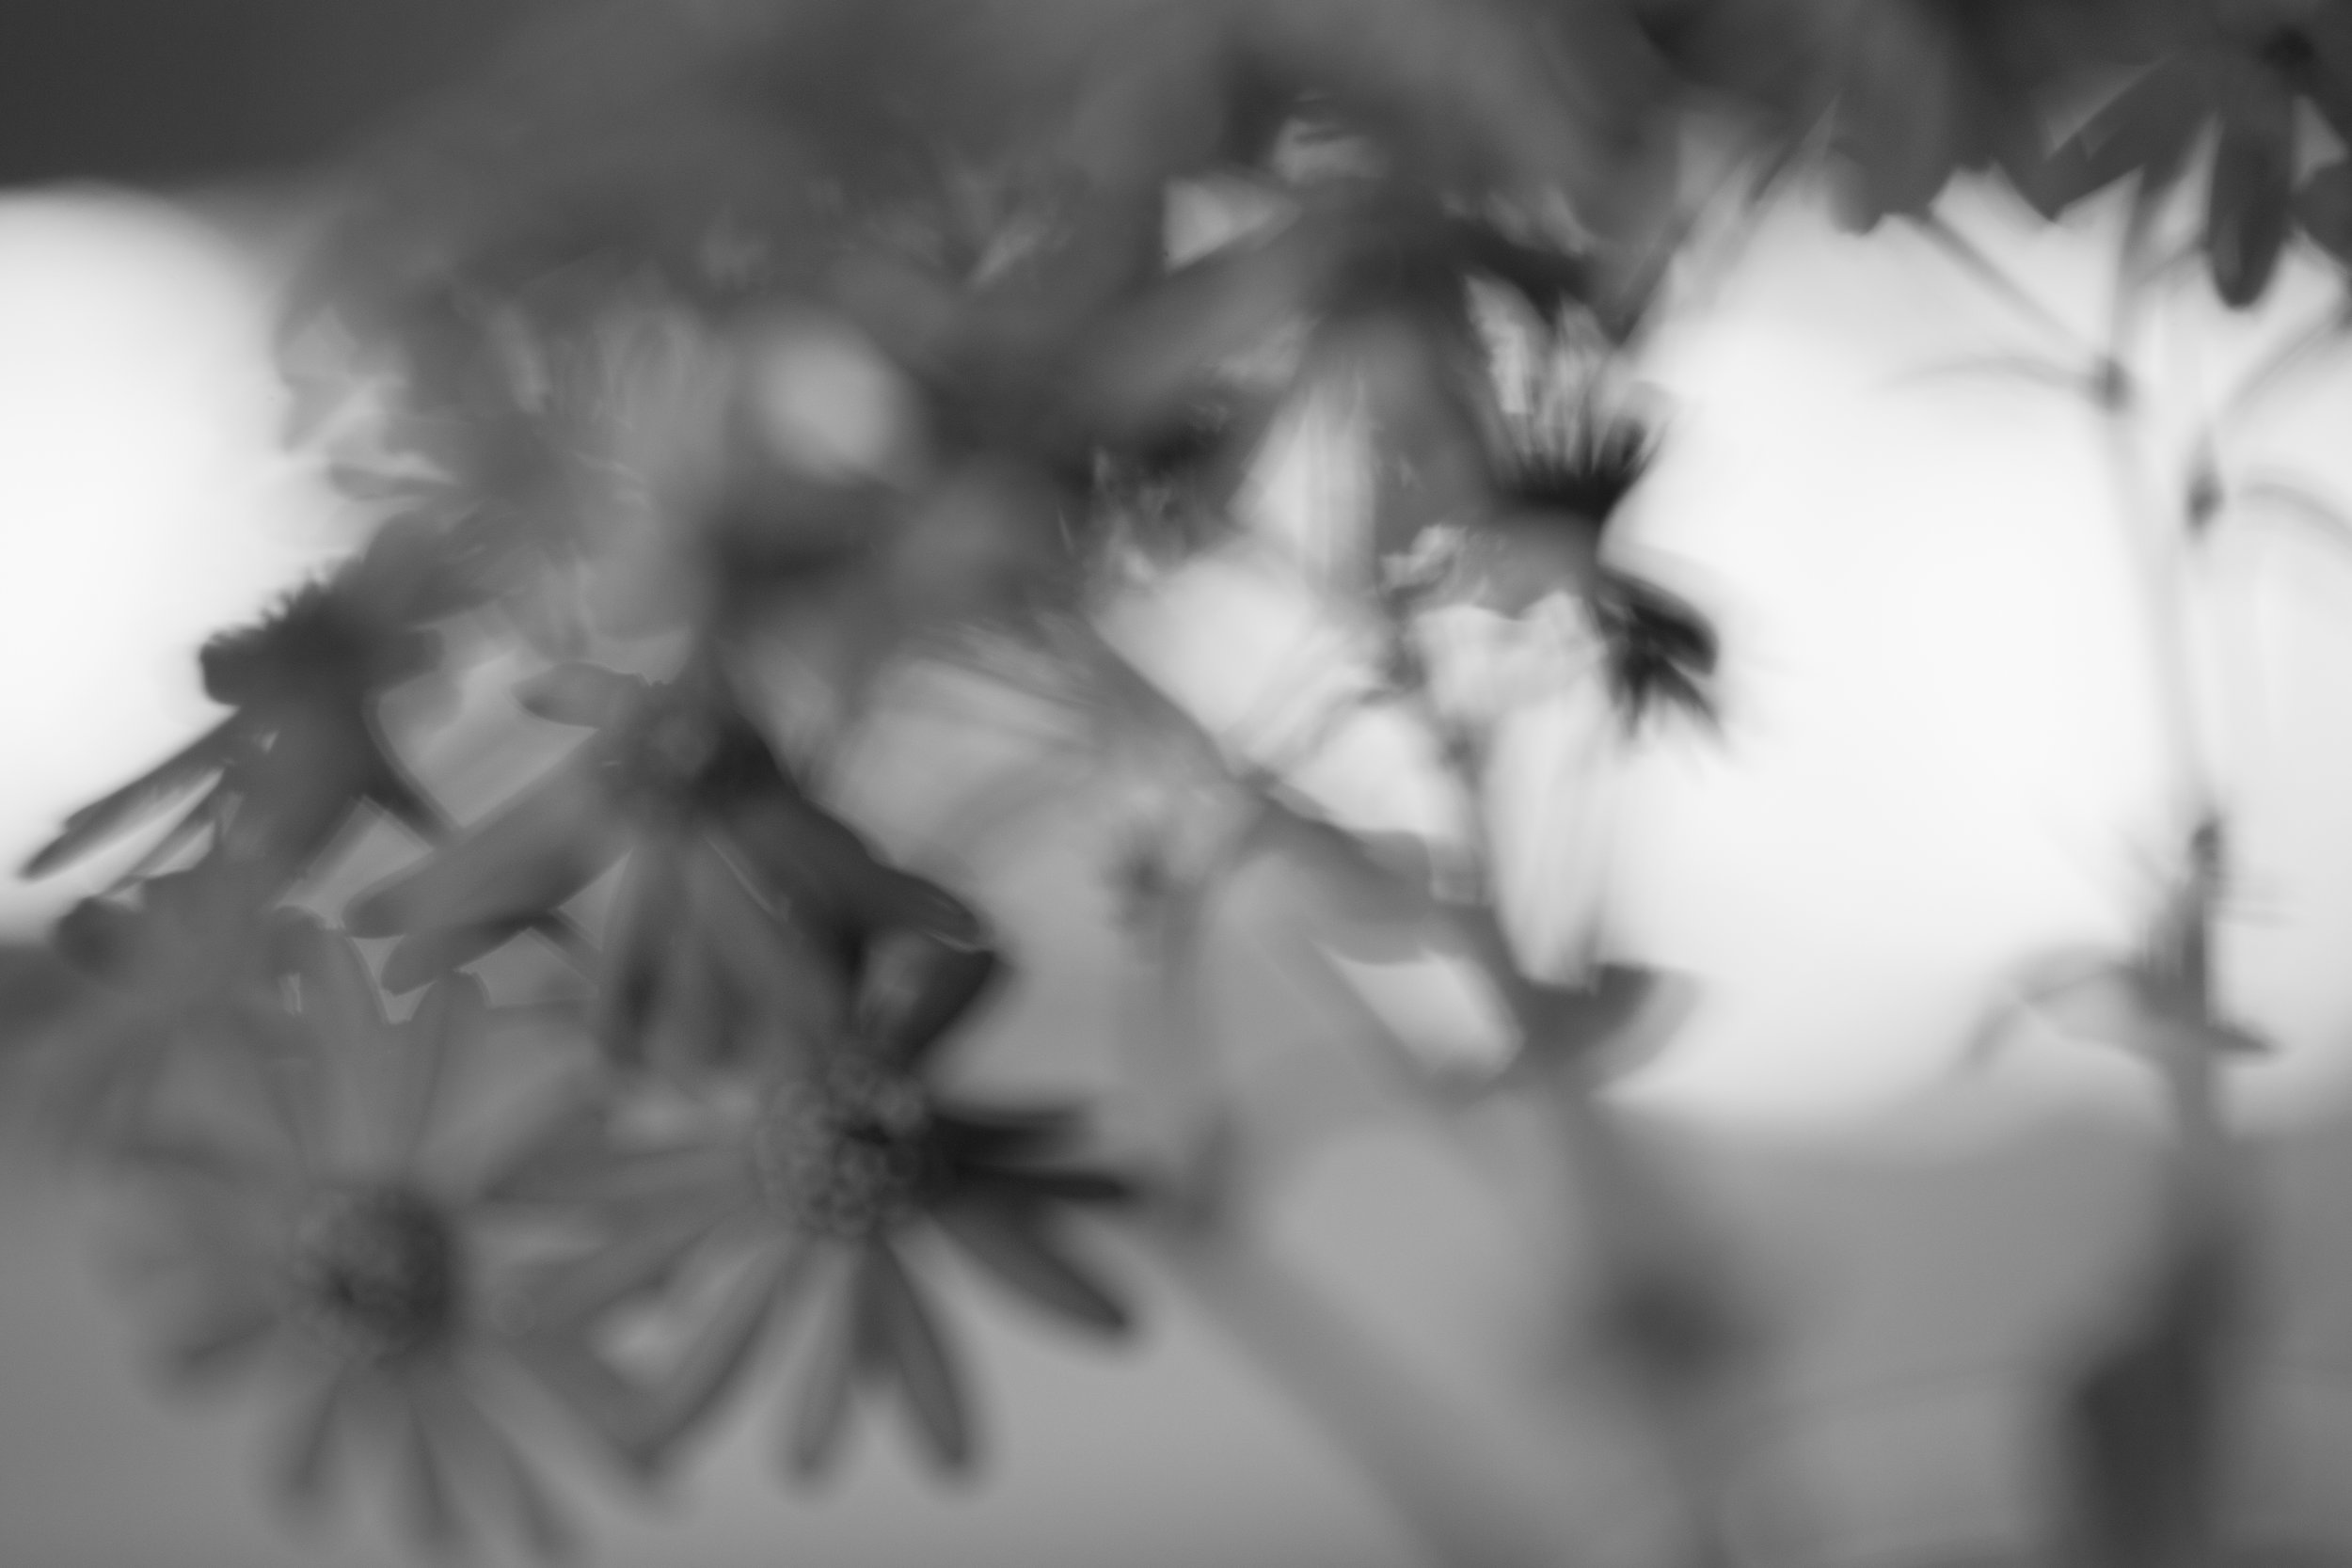 flowerblurrybnw.jpg